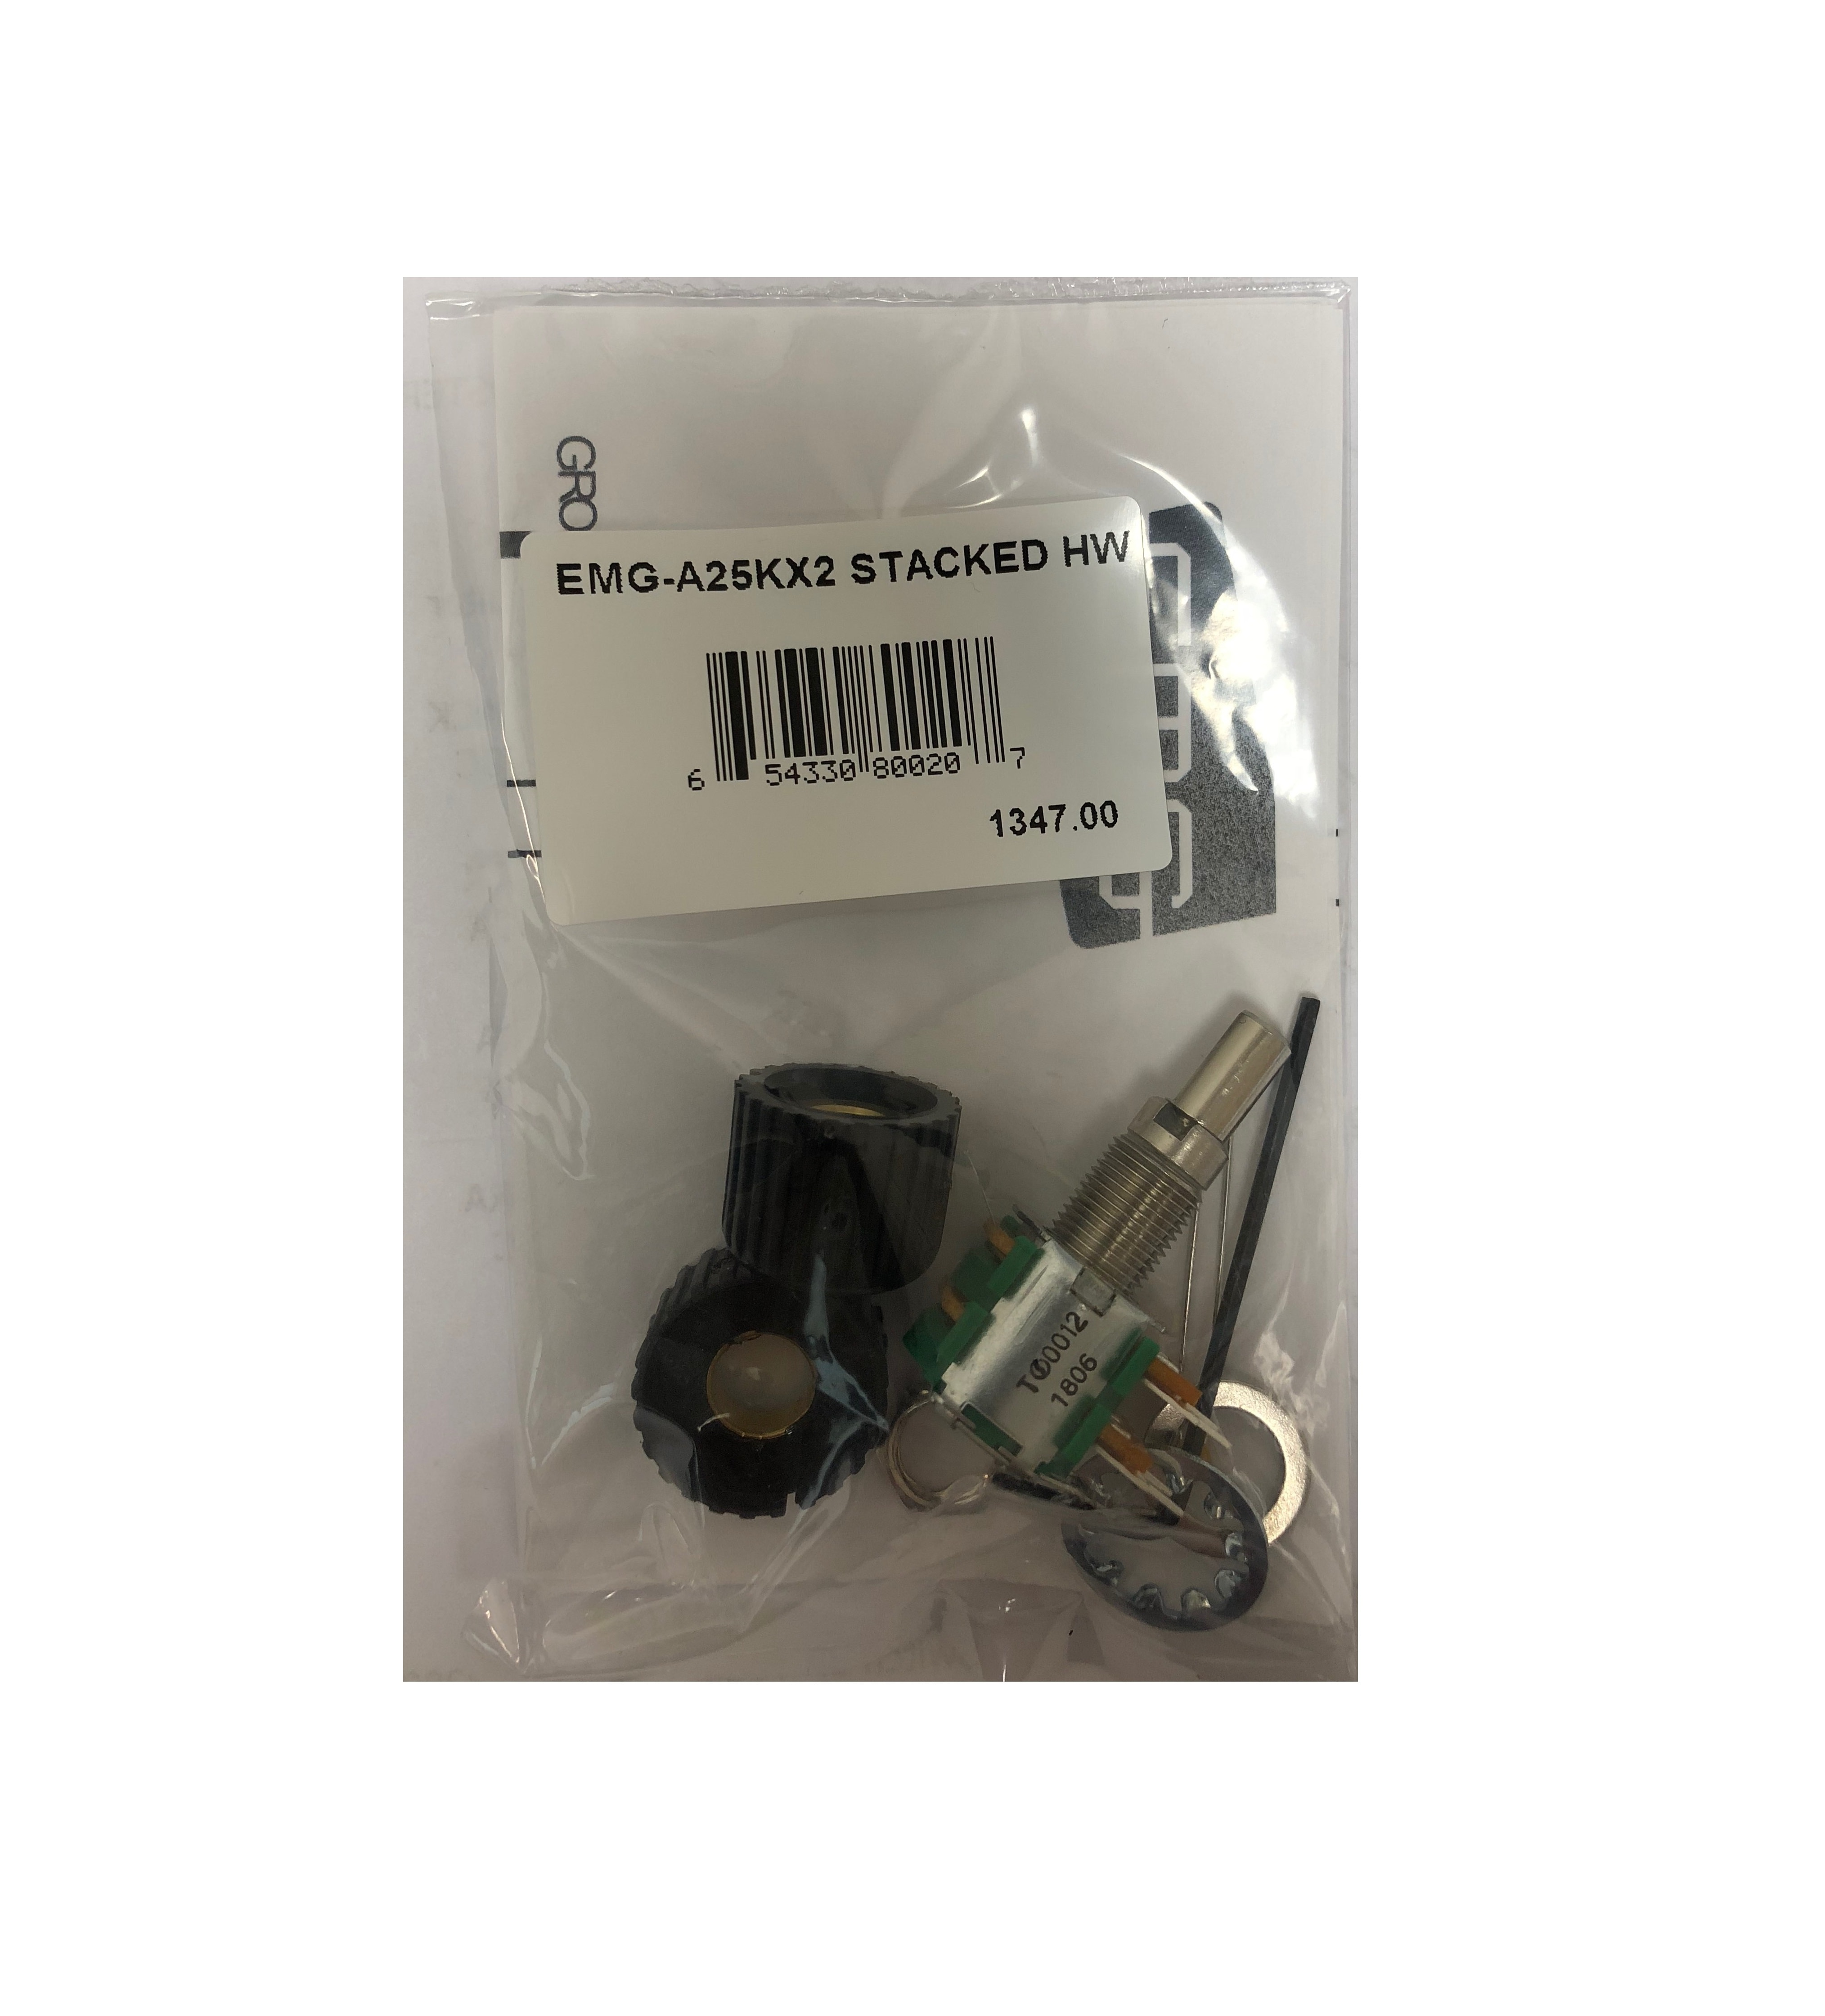 EMG A25KX2 Stacked Volume Potentiometer - 1347